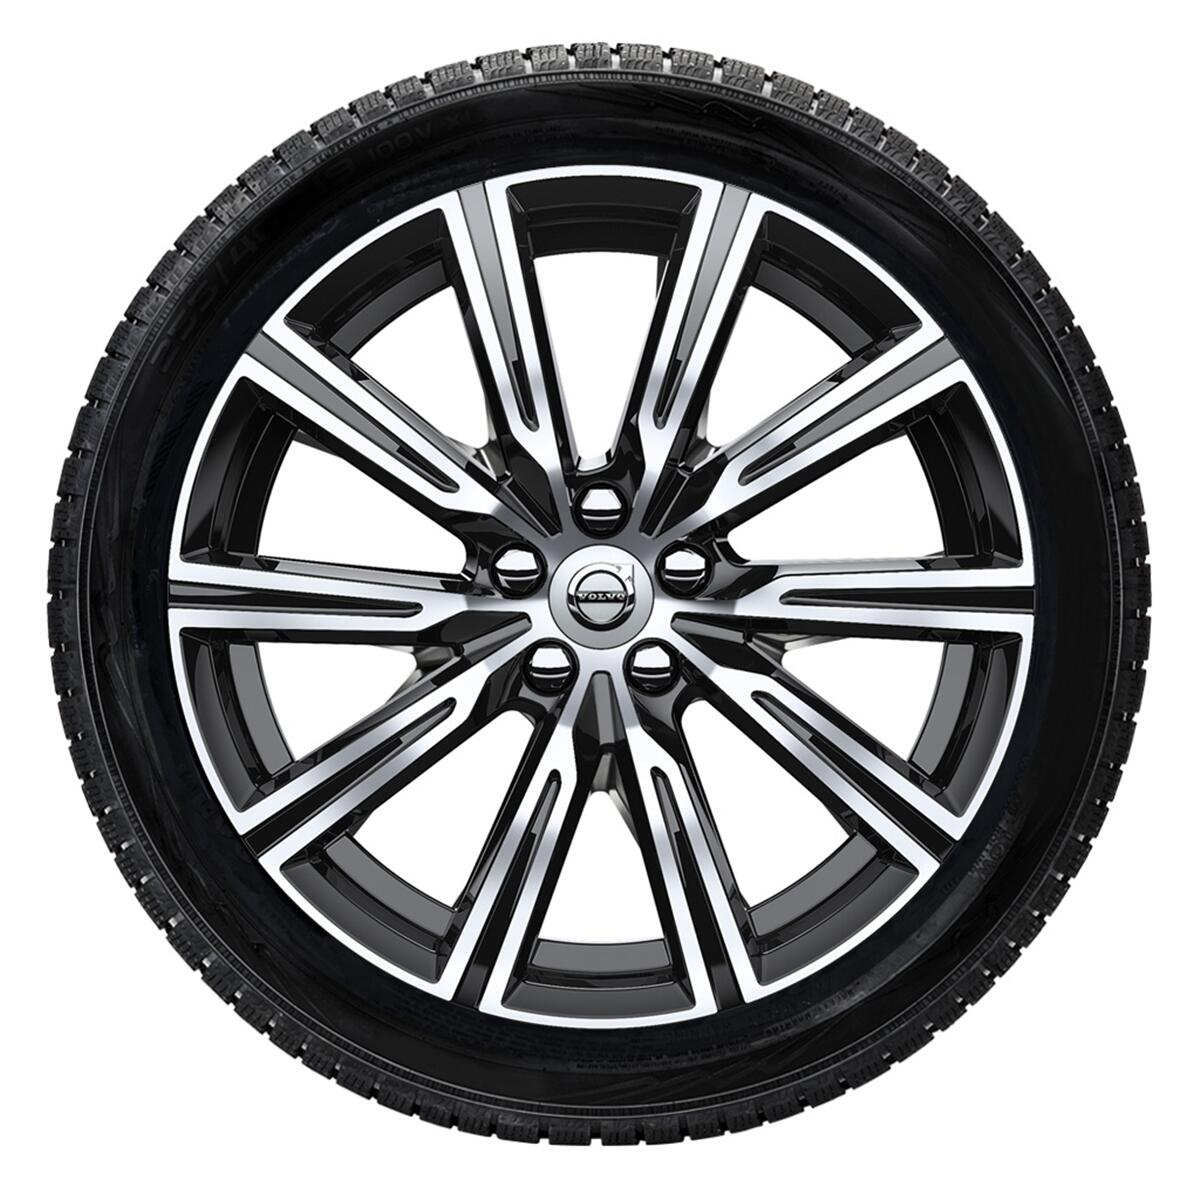 Komplet zimskih koles: 48,26 cm (19''), pnevmatike Michelin